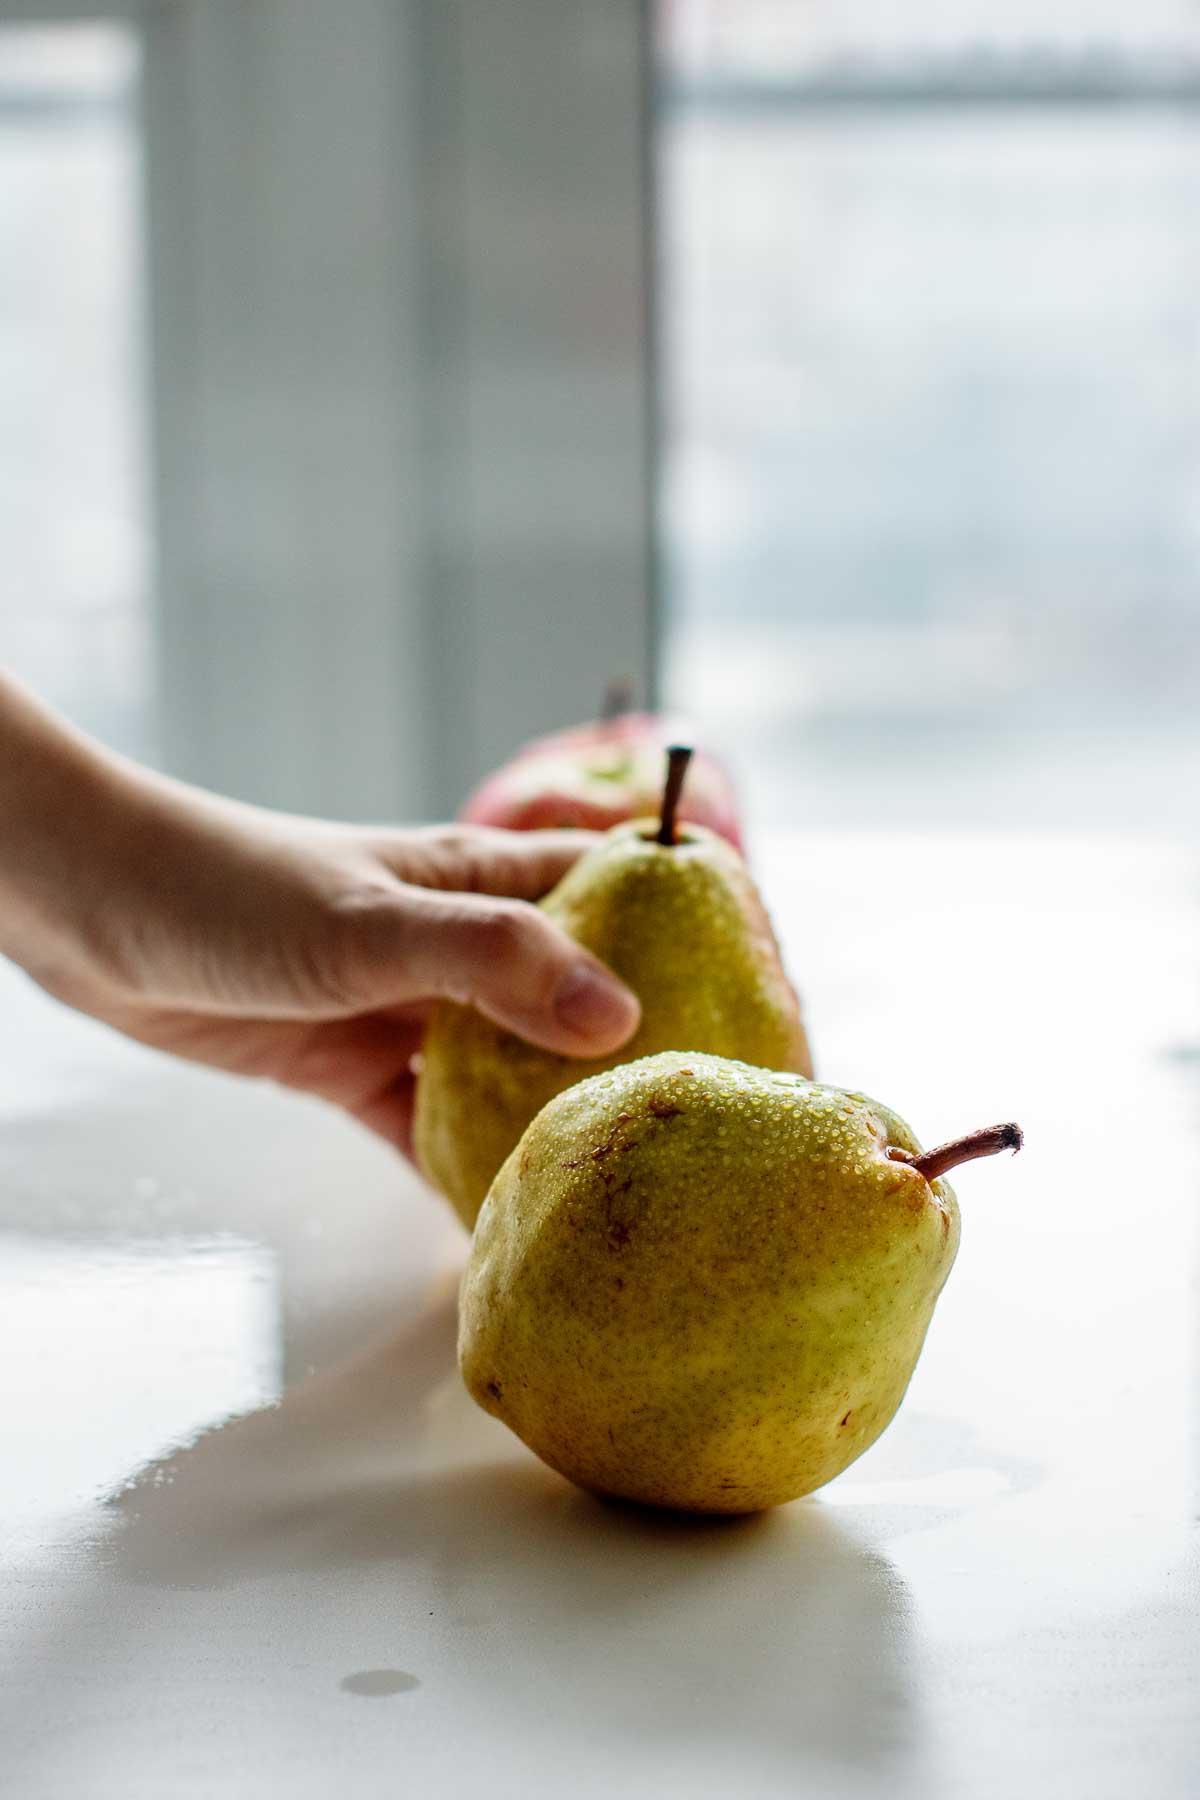 hand grabbing pear